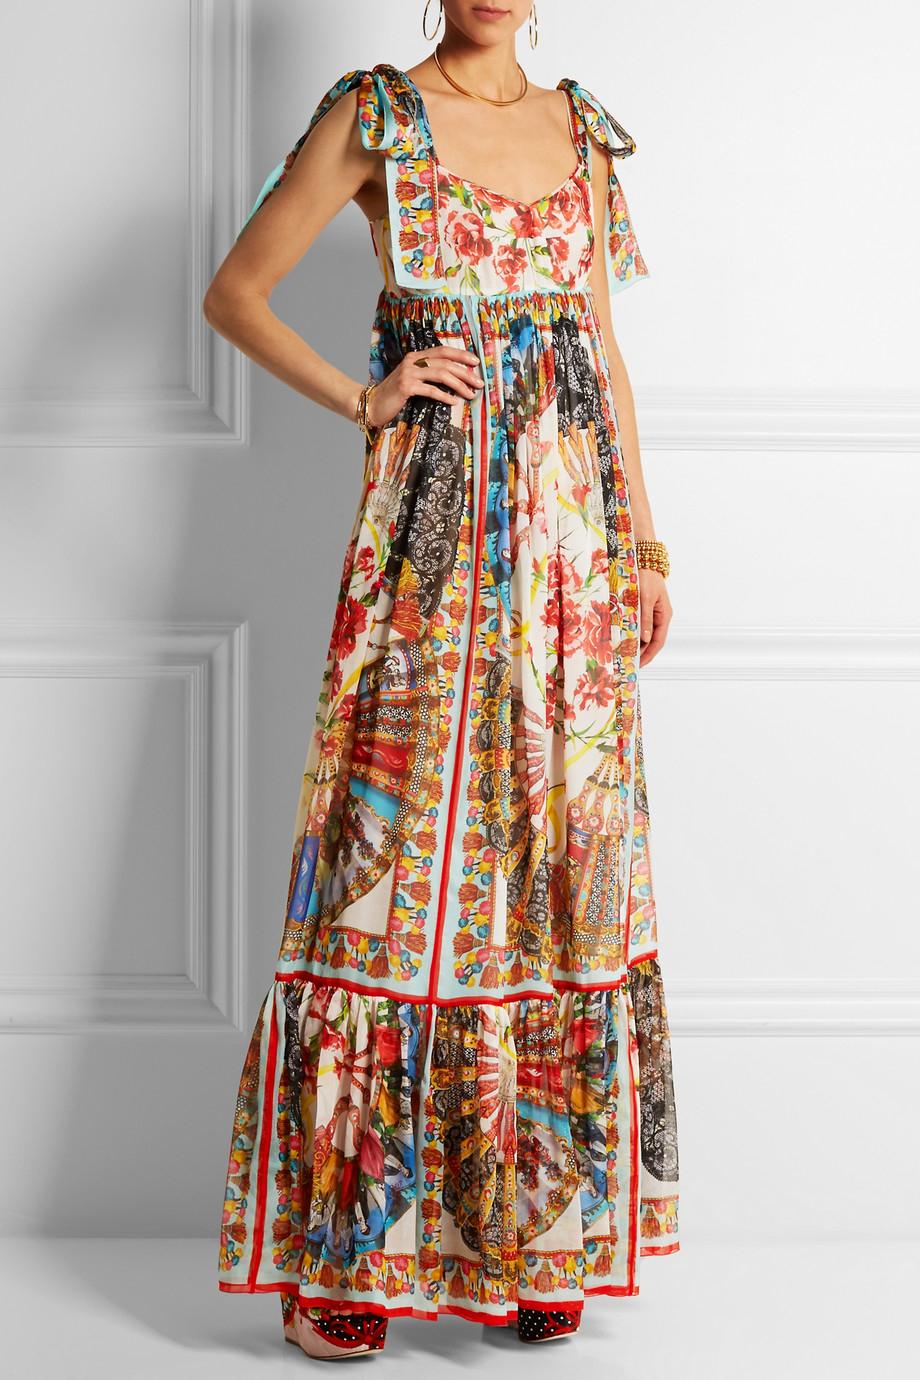 Fringe-trimmed striped maxi dress Dolce & Gabbana Sale Official Cheap Sale For Nice Order Bqjv3